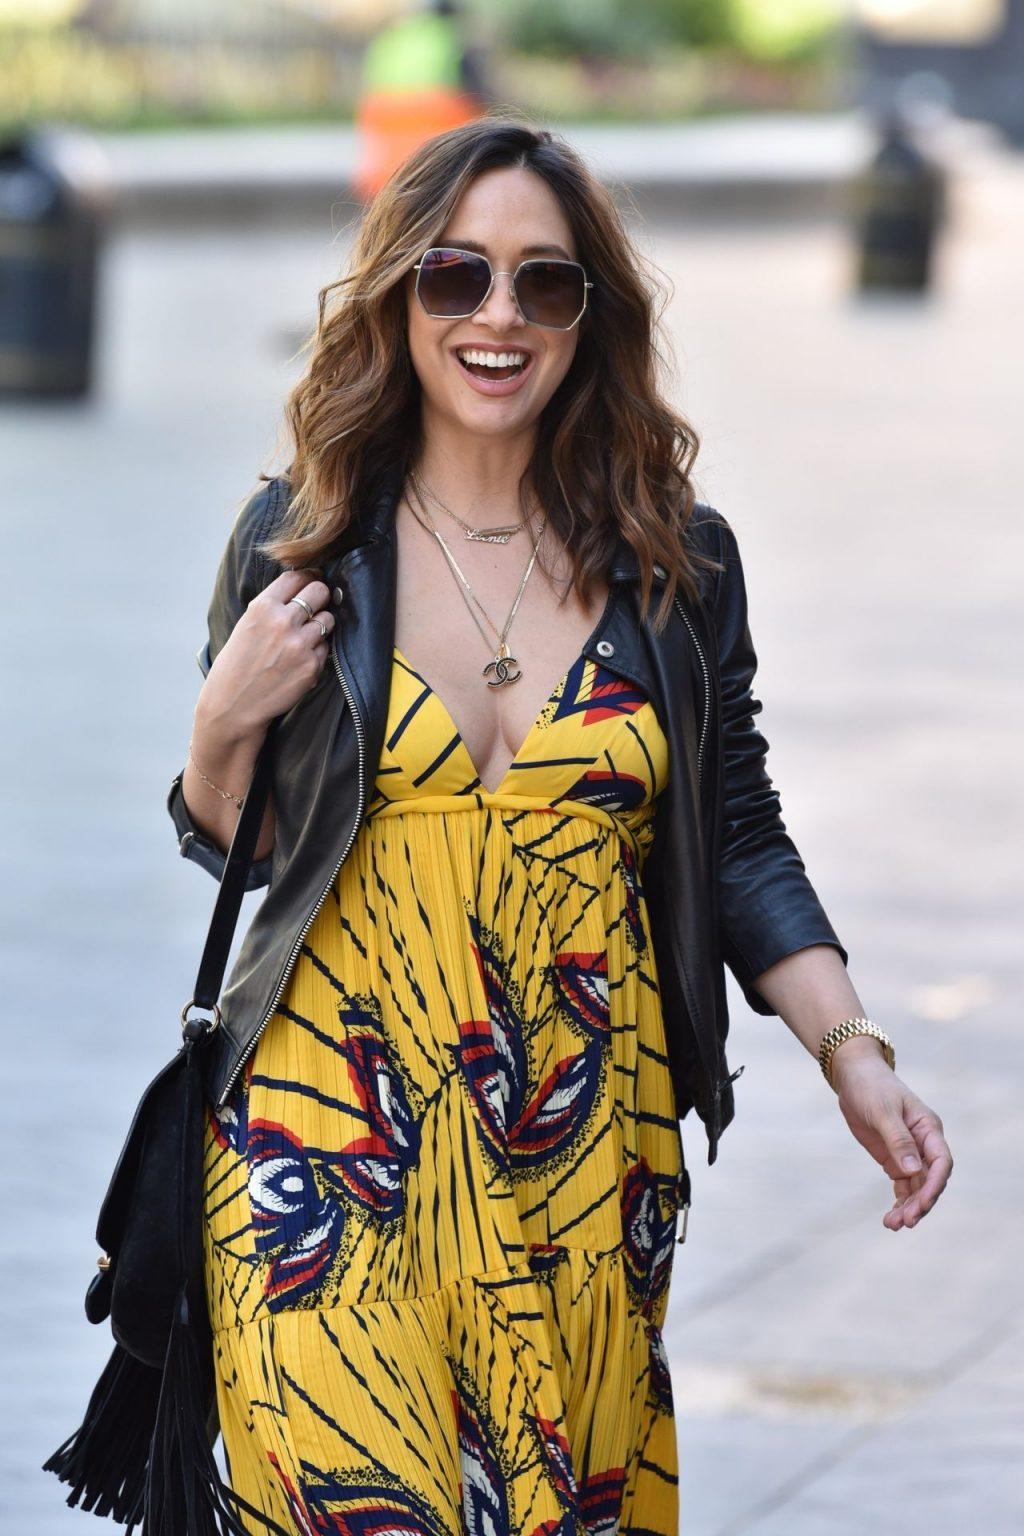 Myleene Klass Looks in Good Spirits as She Arrives at Smooth Radio (24 Photos)